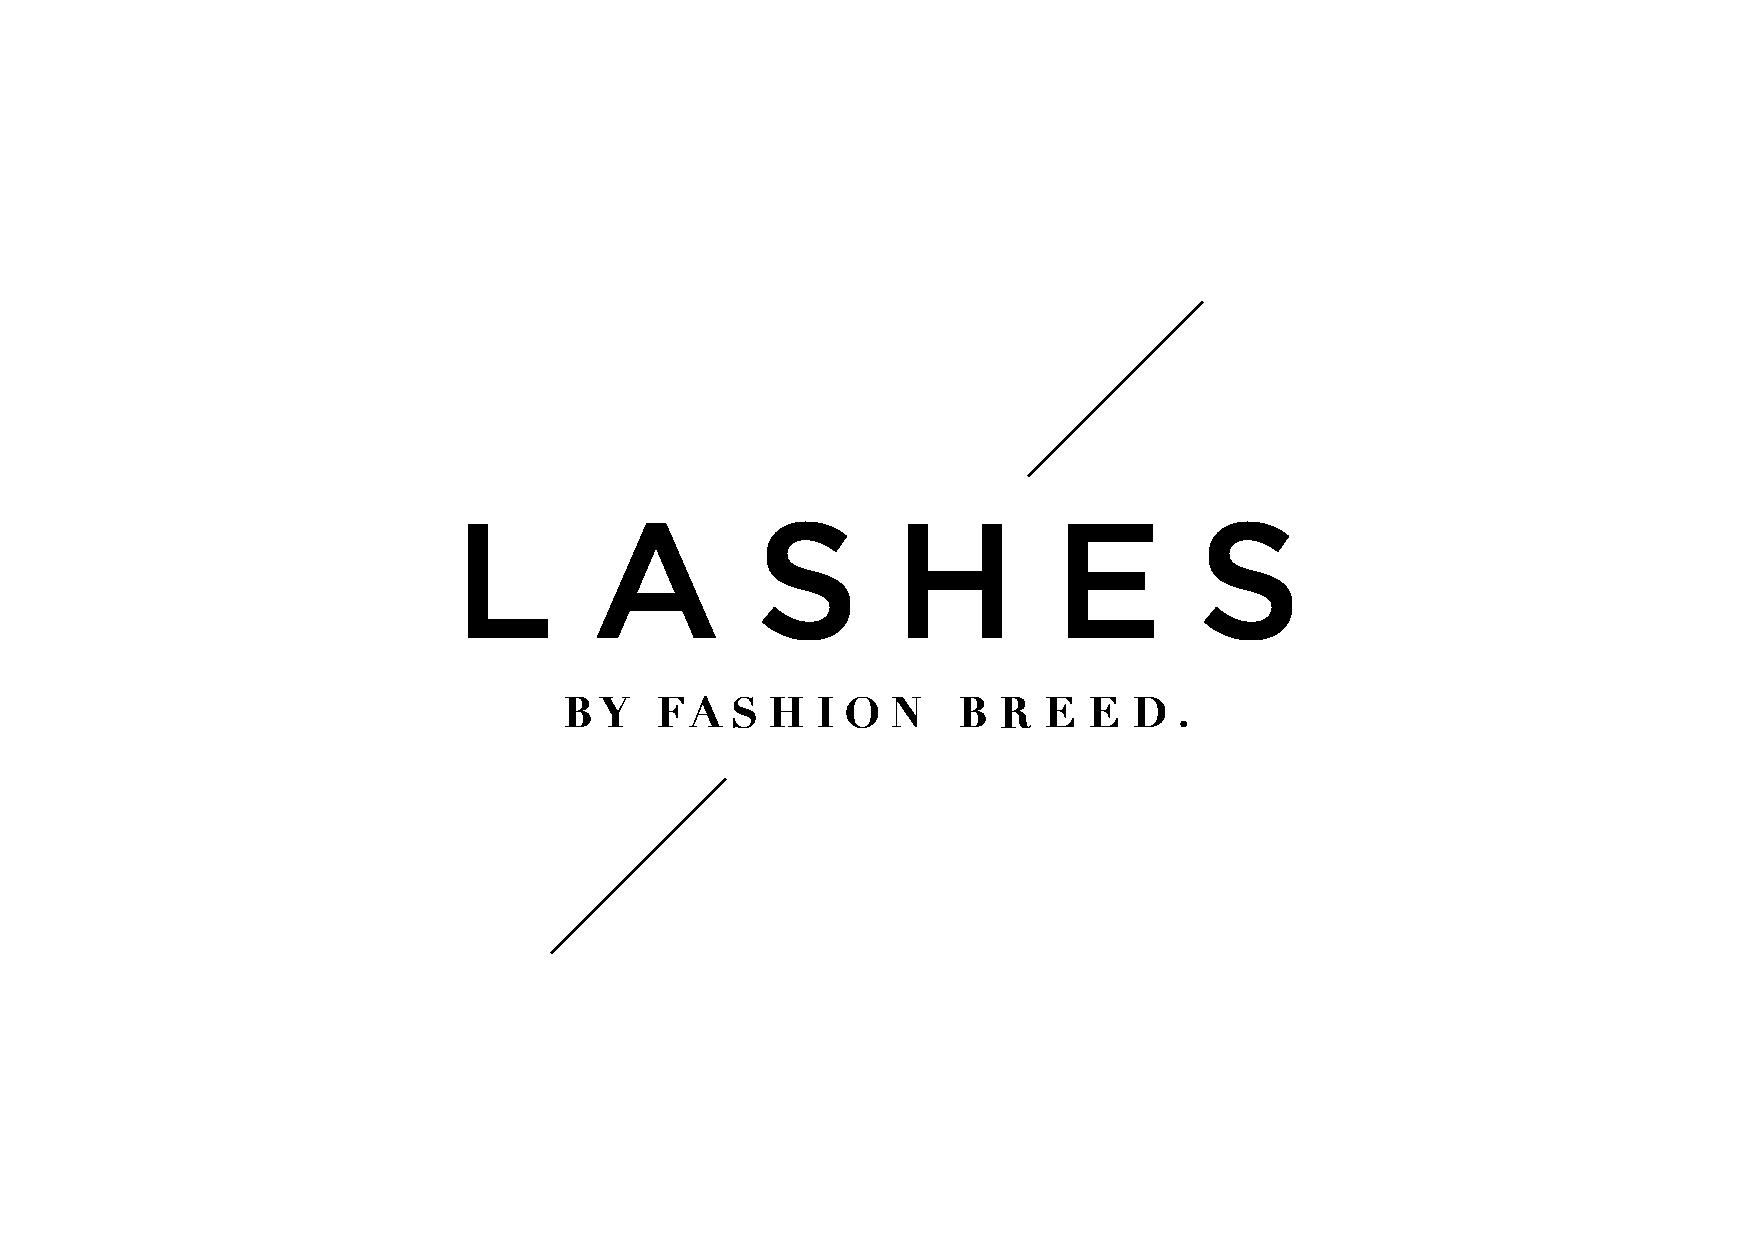 Fashion breed lashes logo 04